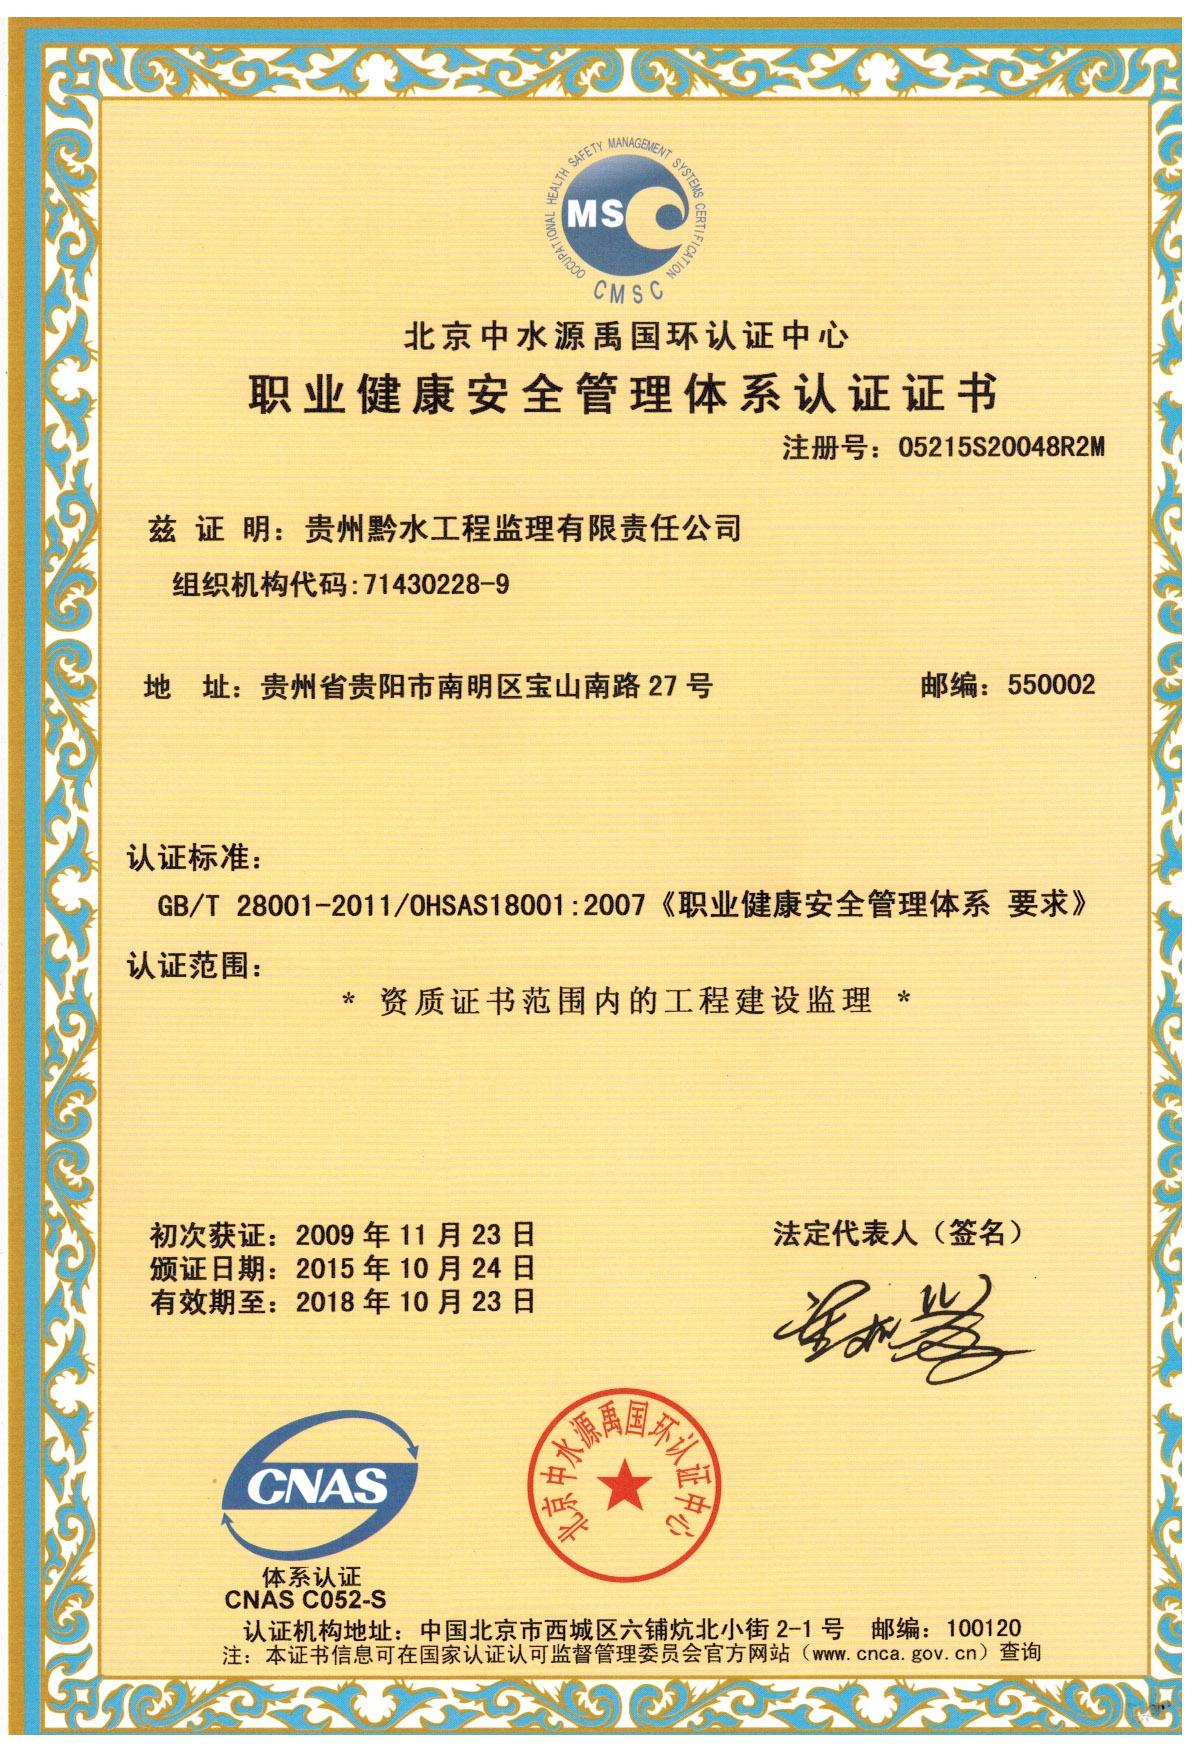 <span>职业健康安全管理体系认证证书2015</span>